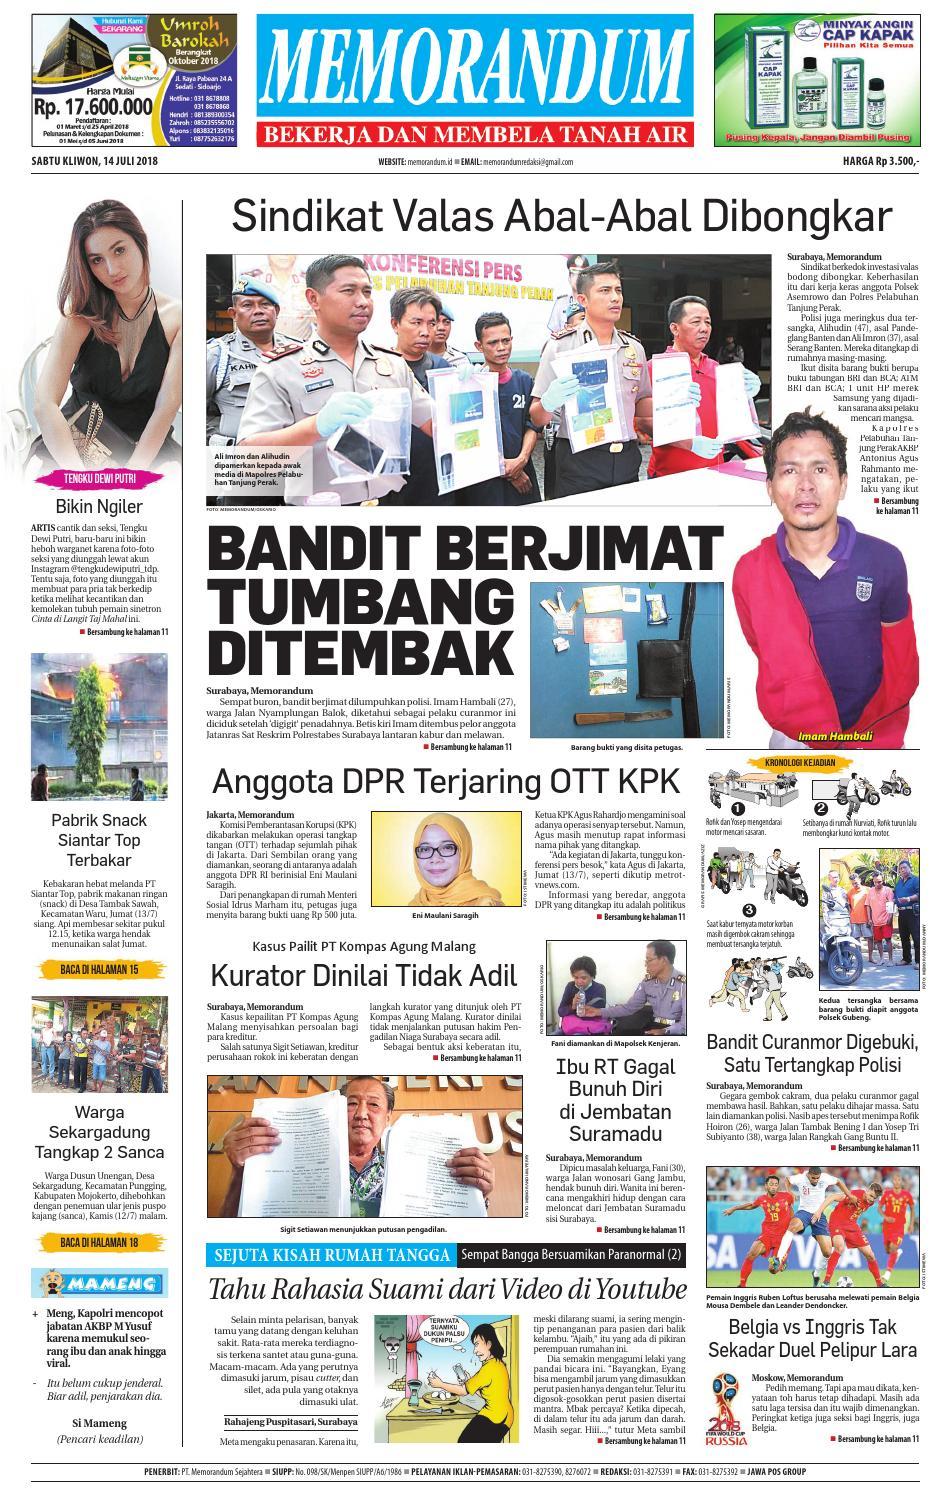 Memorandum Edisi 14 Juli 2018 By Issuu Snack Gayem Pangsit Bantal Imut Bdg